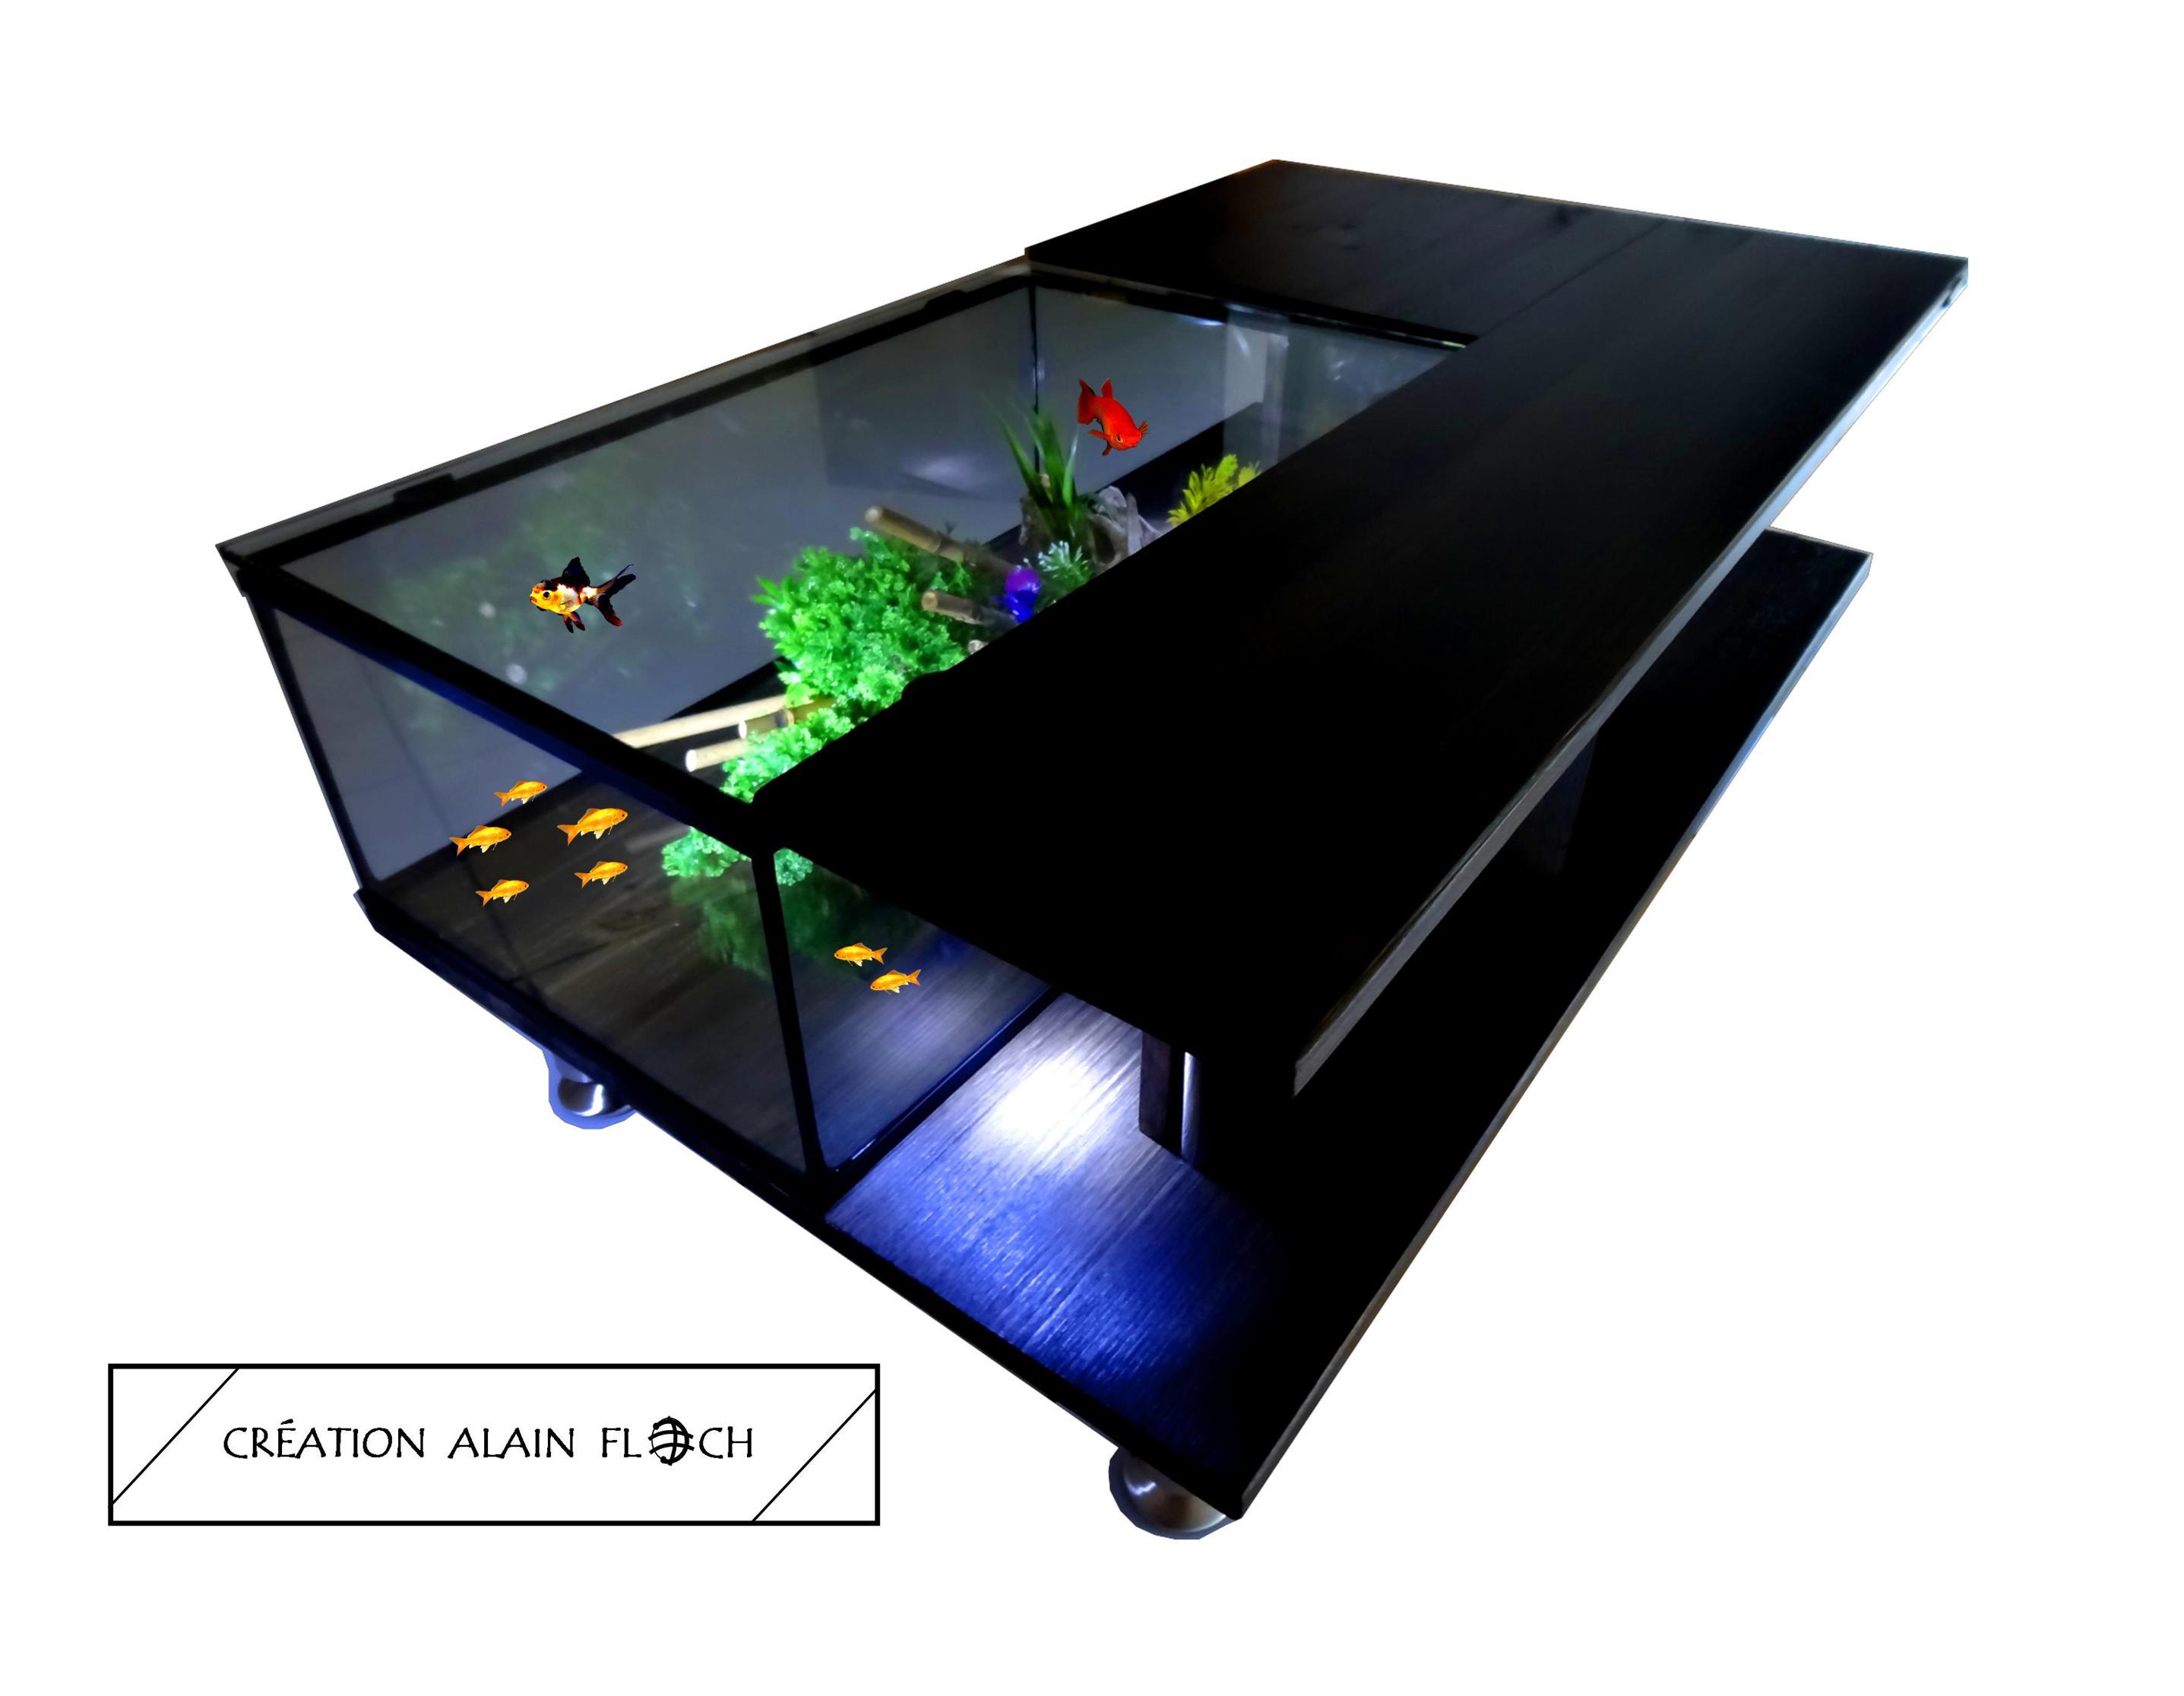 conseil s table basse aquarium terrarium poissons tortues. Black Bedroom Furniture Sets. Home Design Ideas